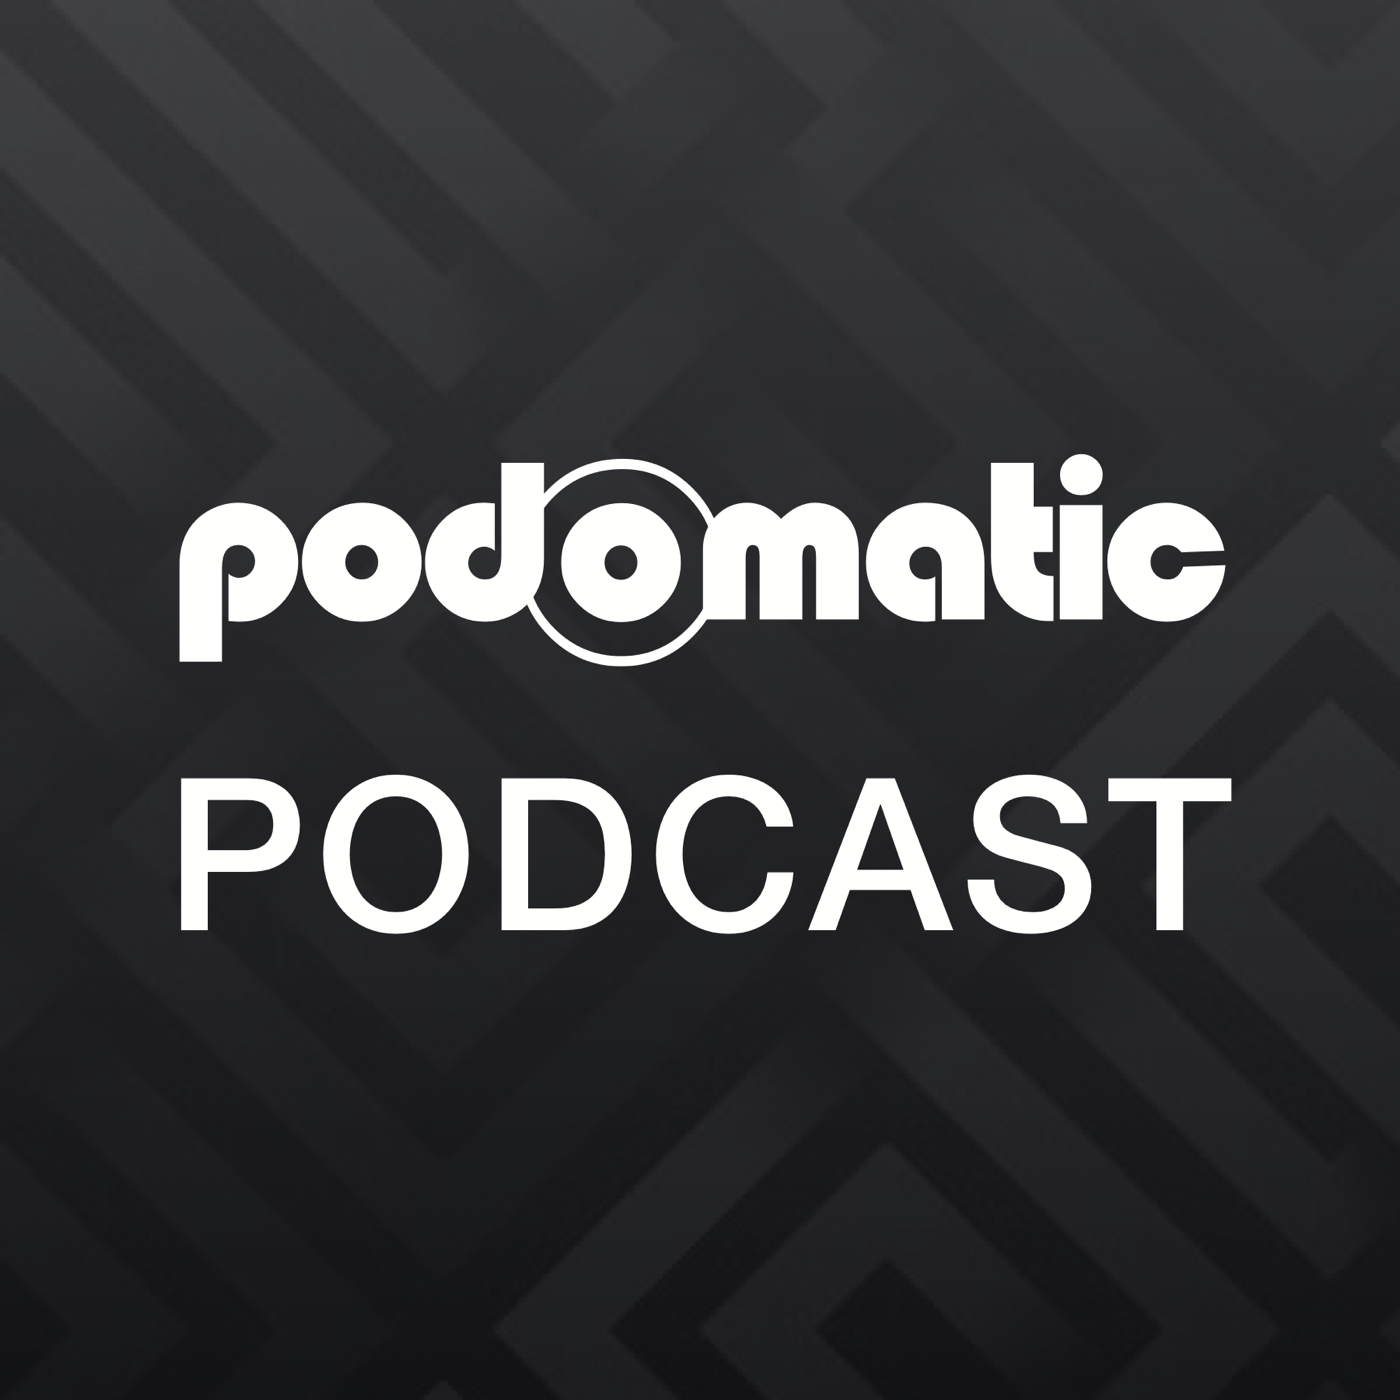 Elizabethtown Presbyterian Church's Podcast